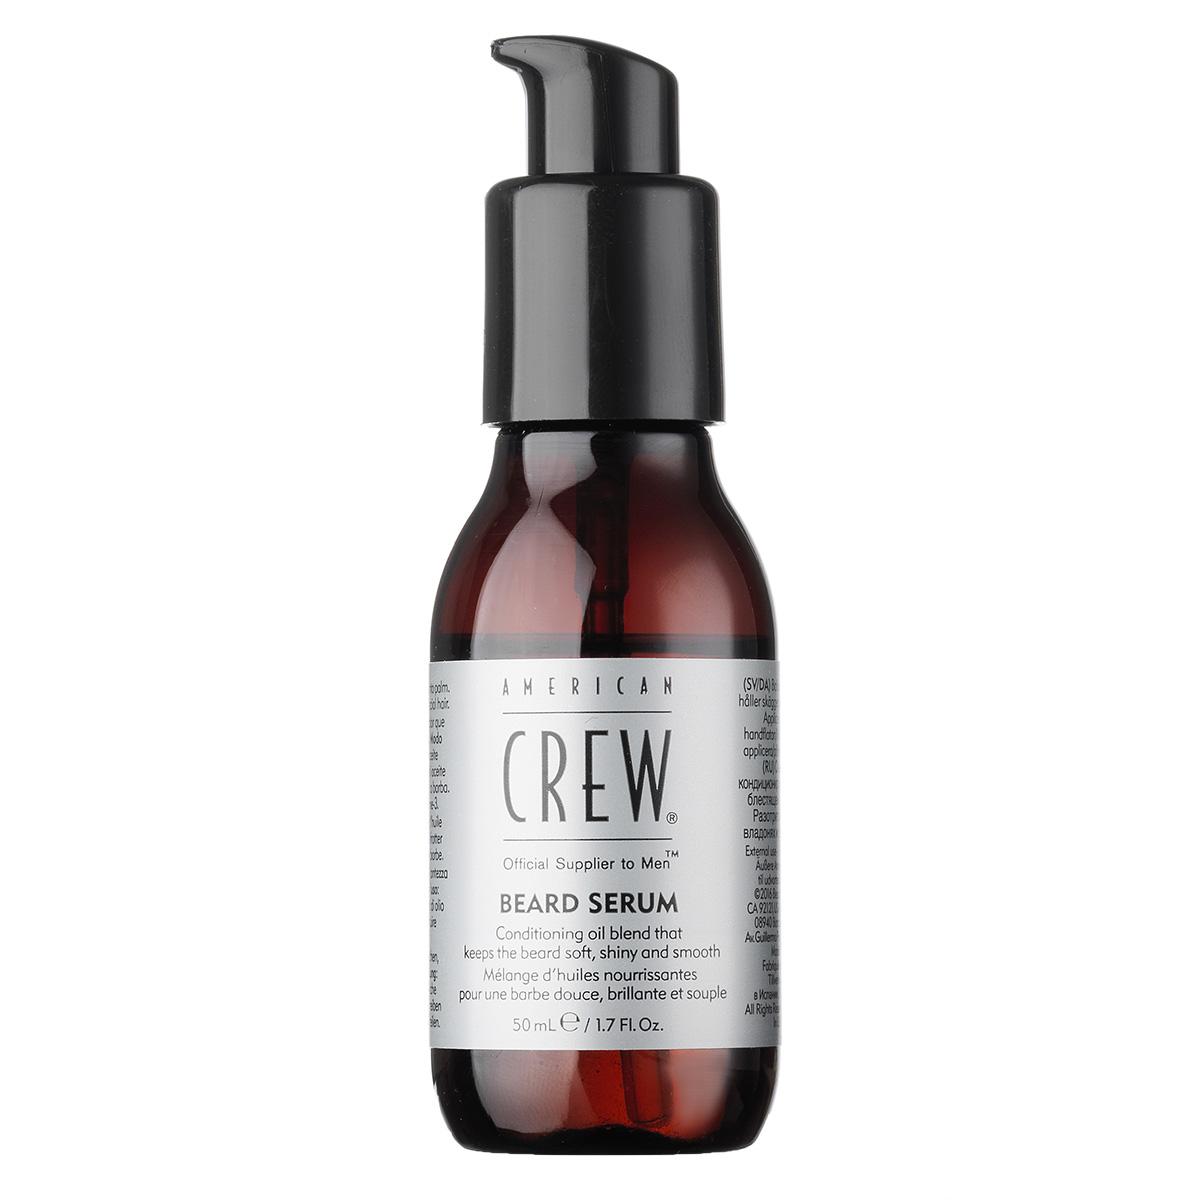 American Crew Beard Serum - 50 ml